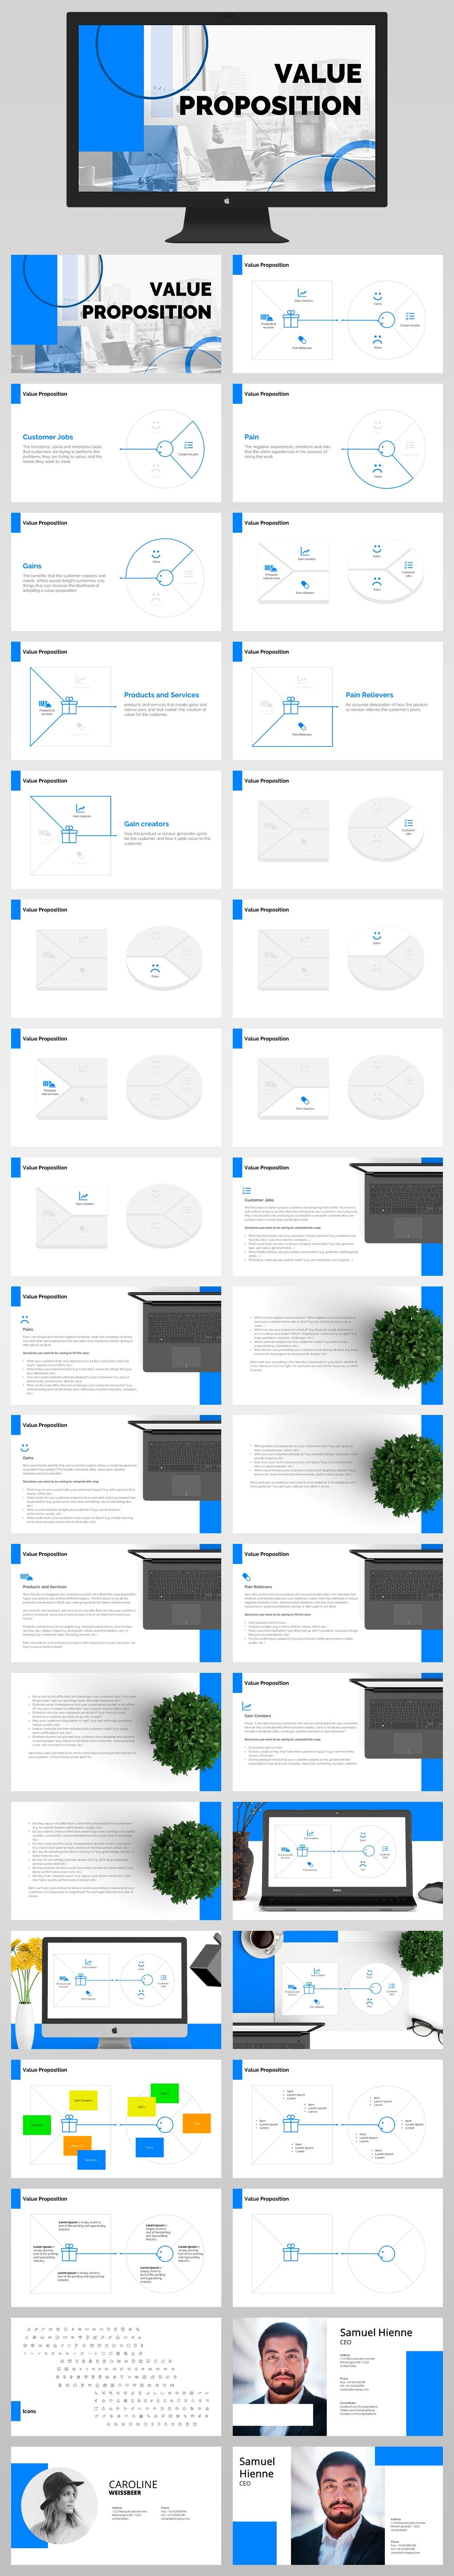 Value Presentation Template Powerpoint All Slides LIght